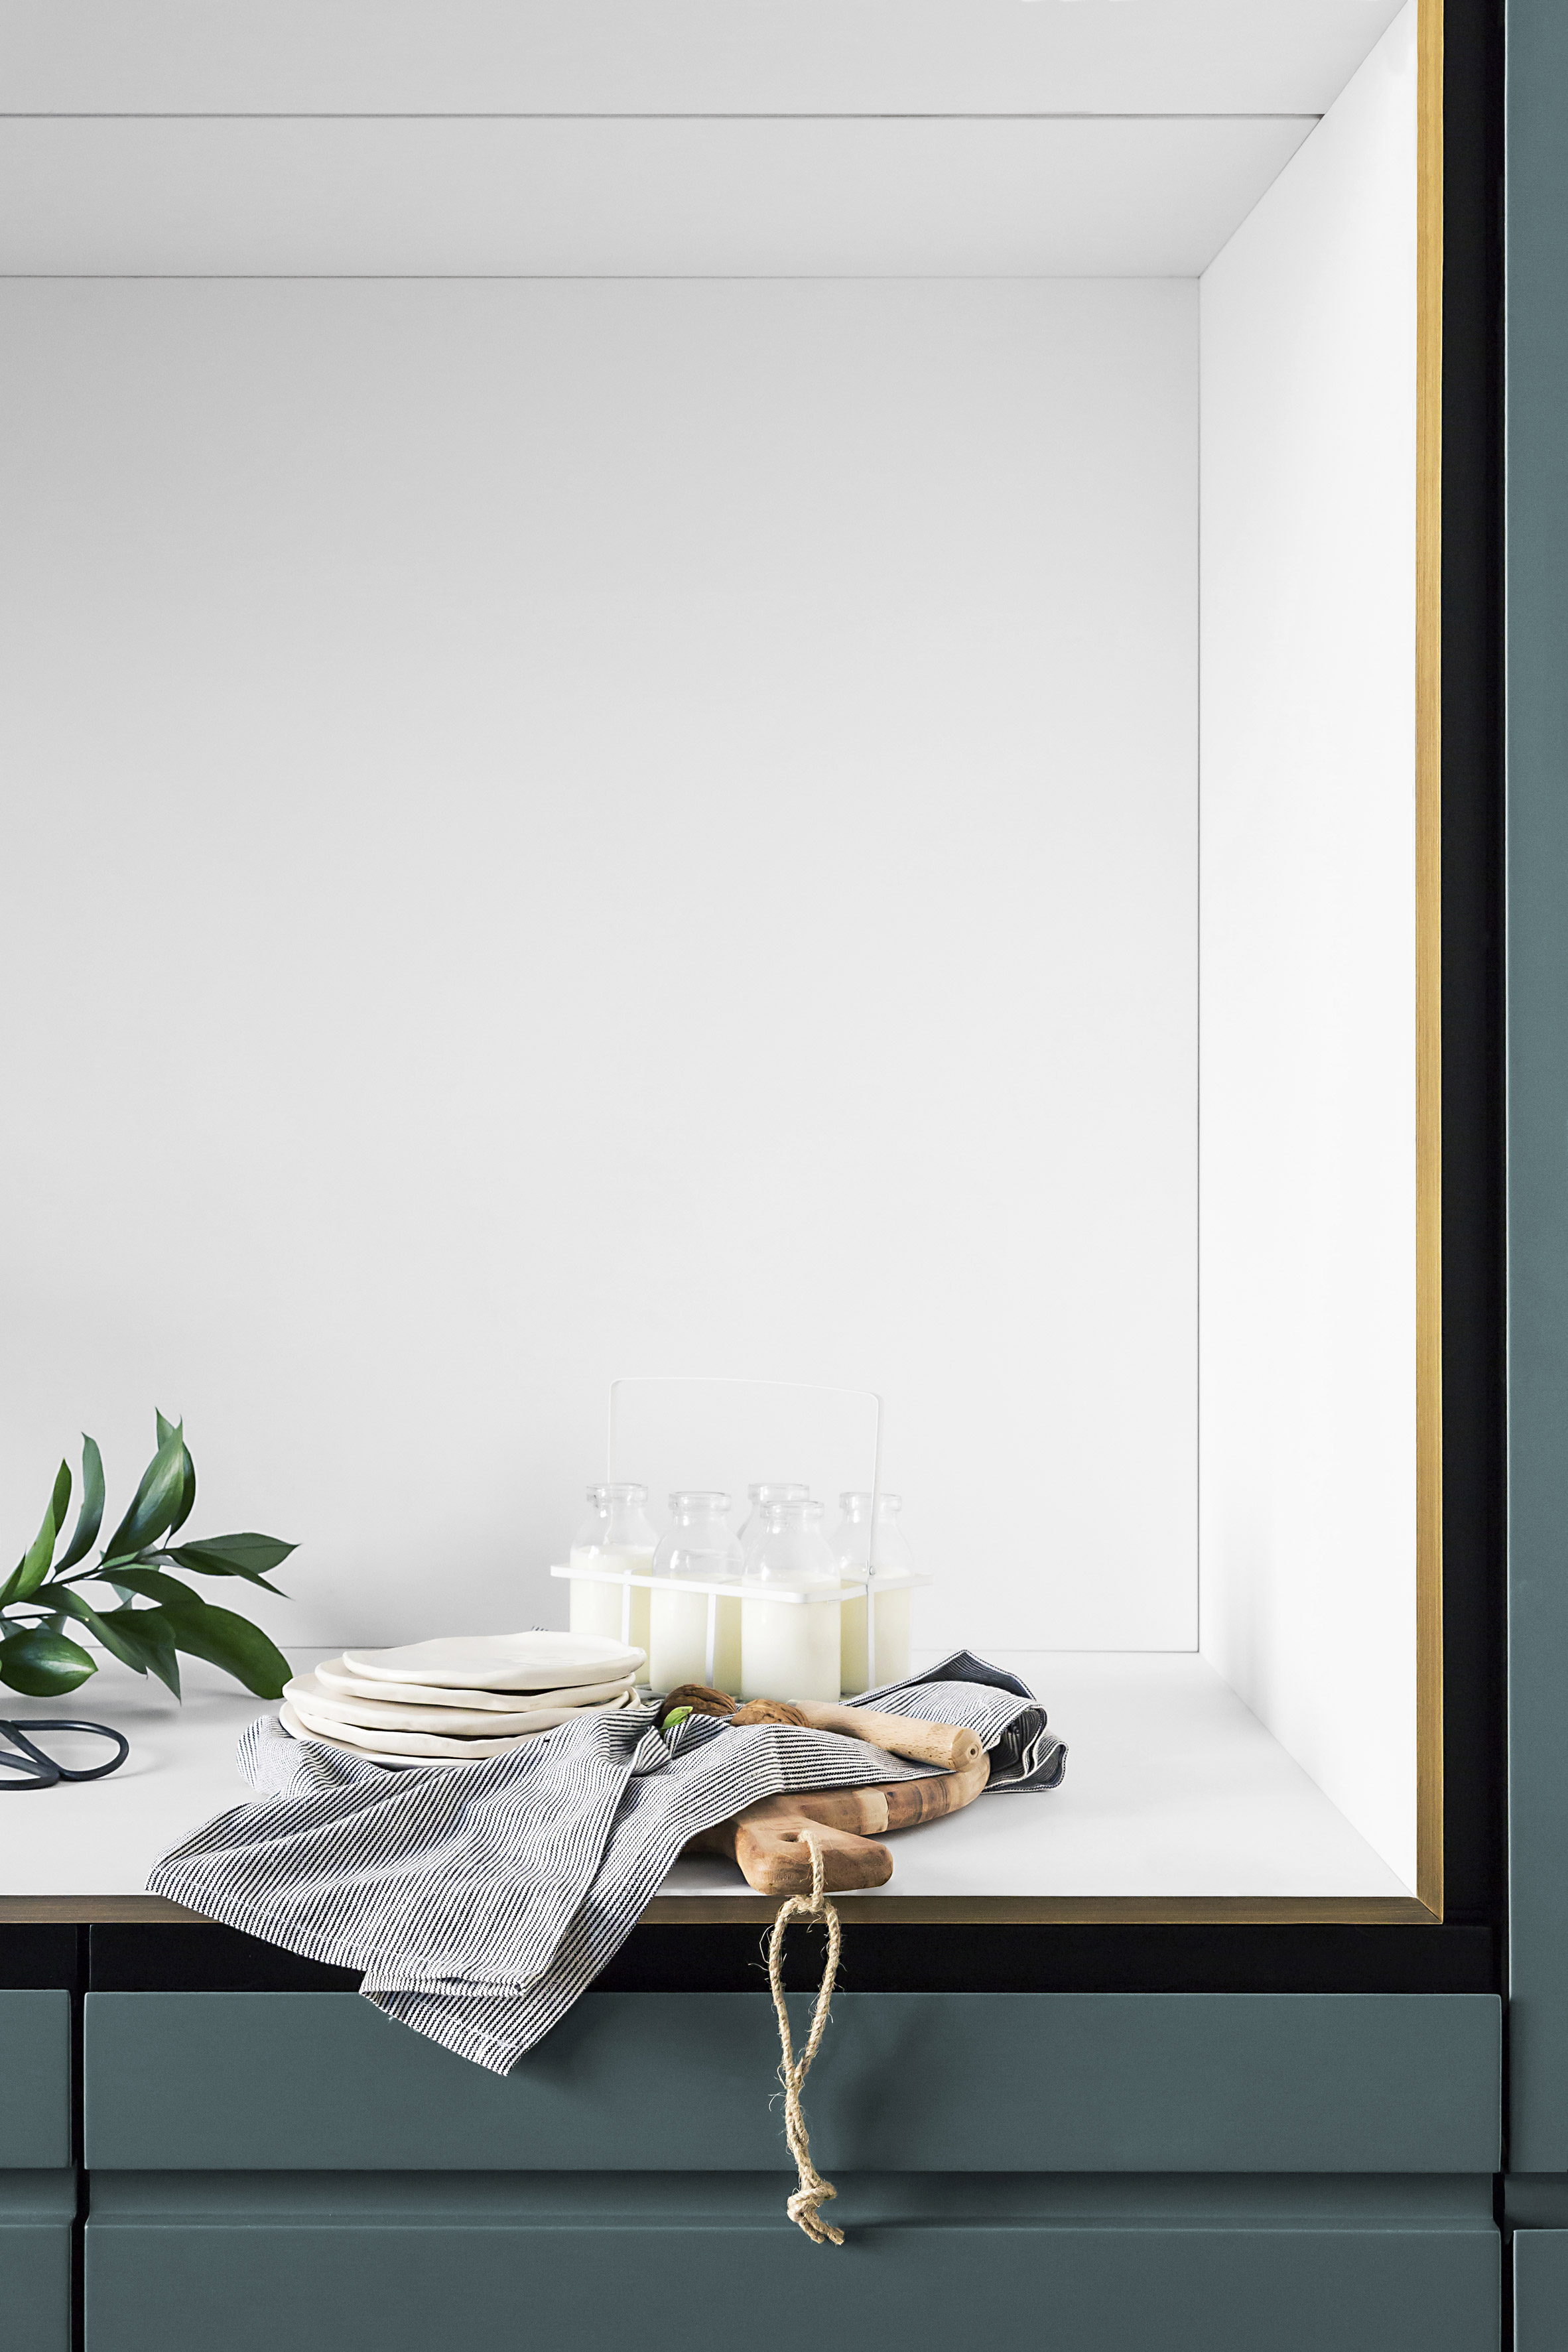 architecture-house-residential-design-studia-interiors-osnovadesign-osnova-poltava_07